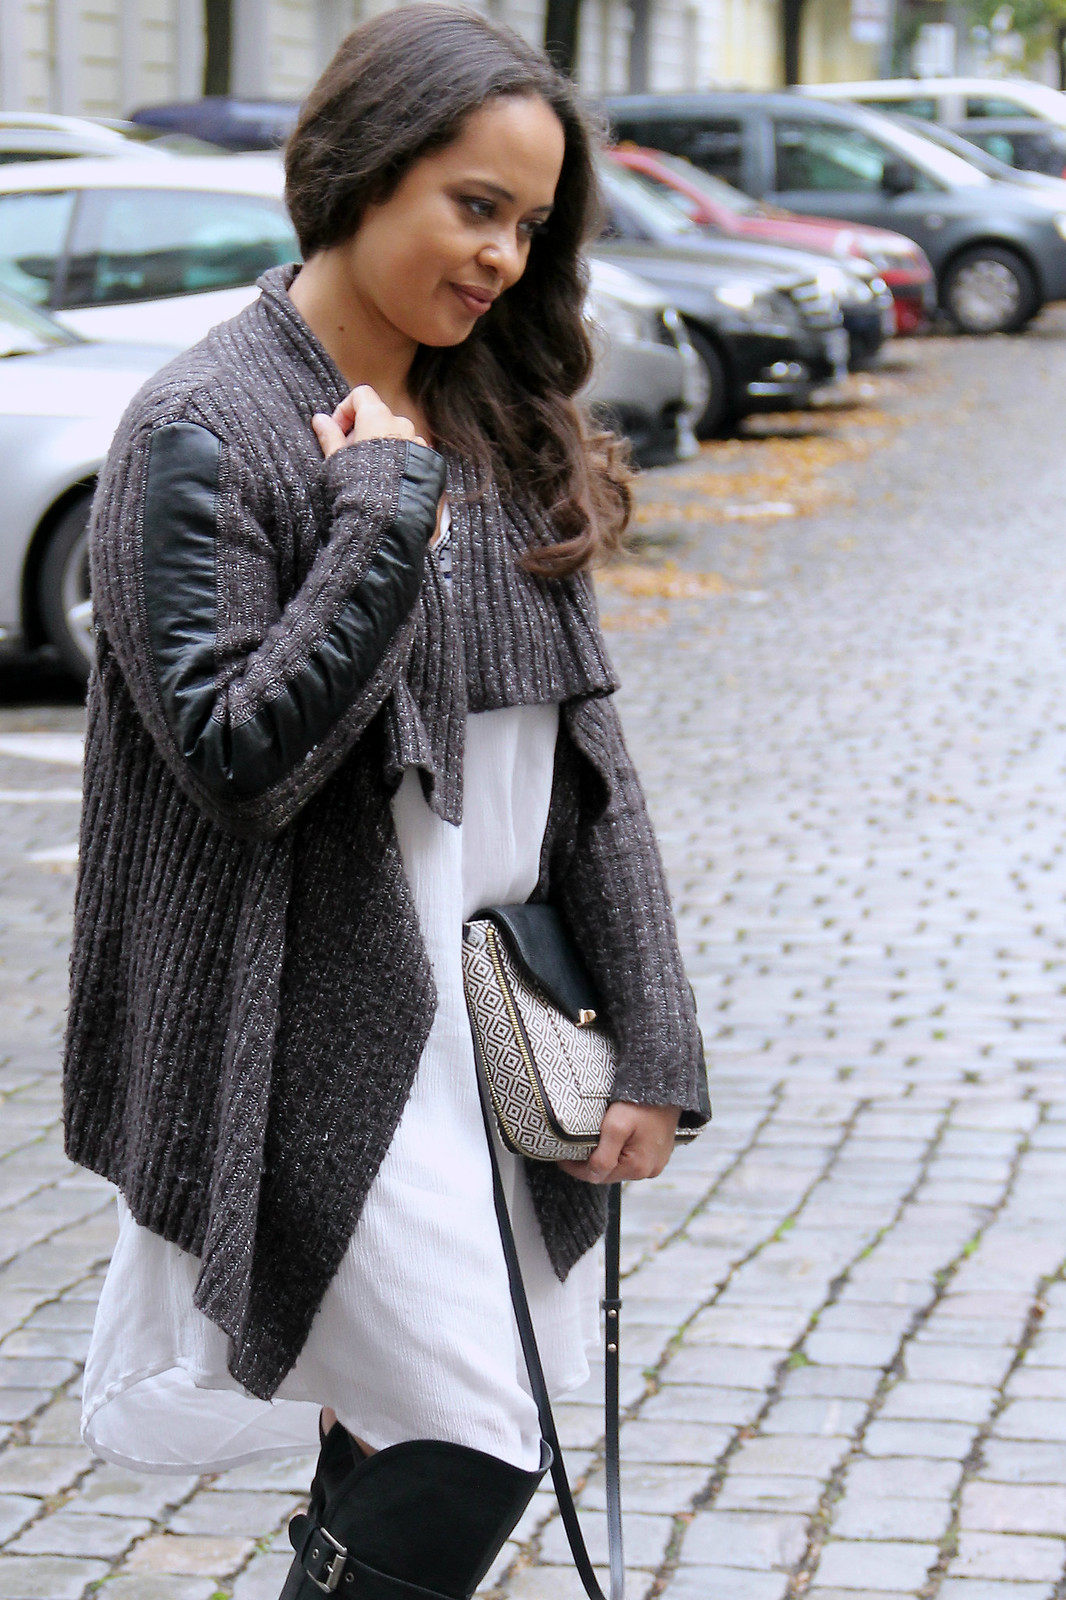 Orsay Knit, C&A Dress, JustFab Overknees, Stella & Dot Bag